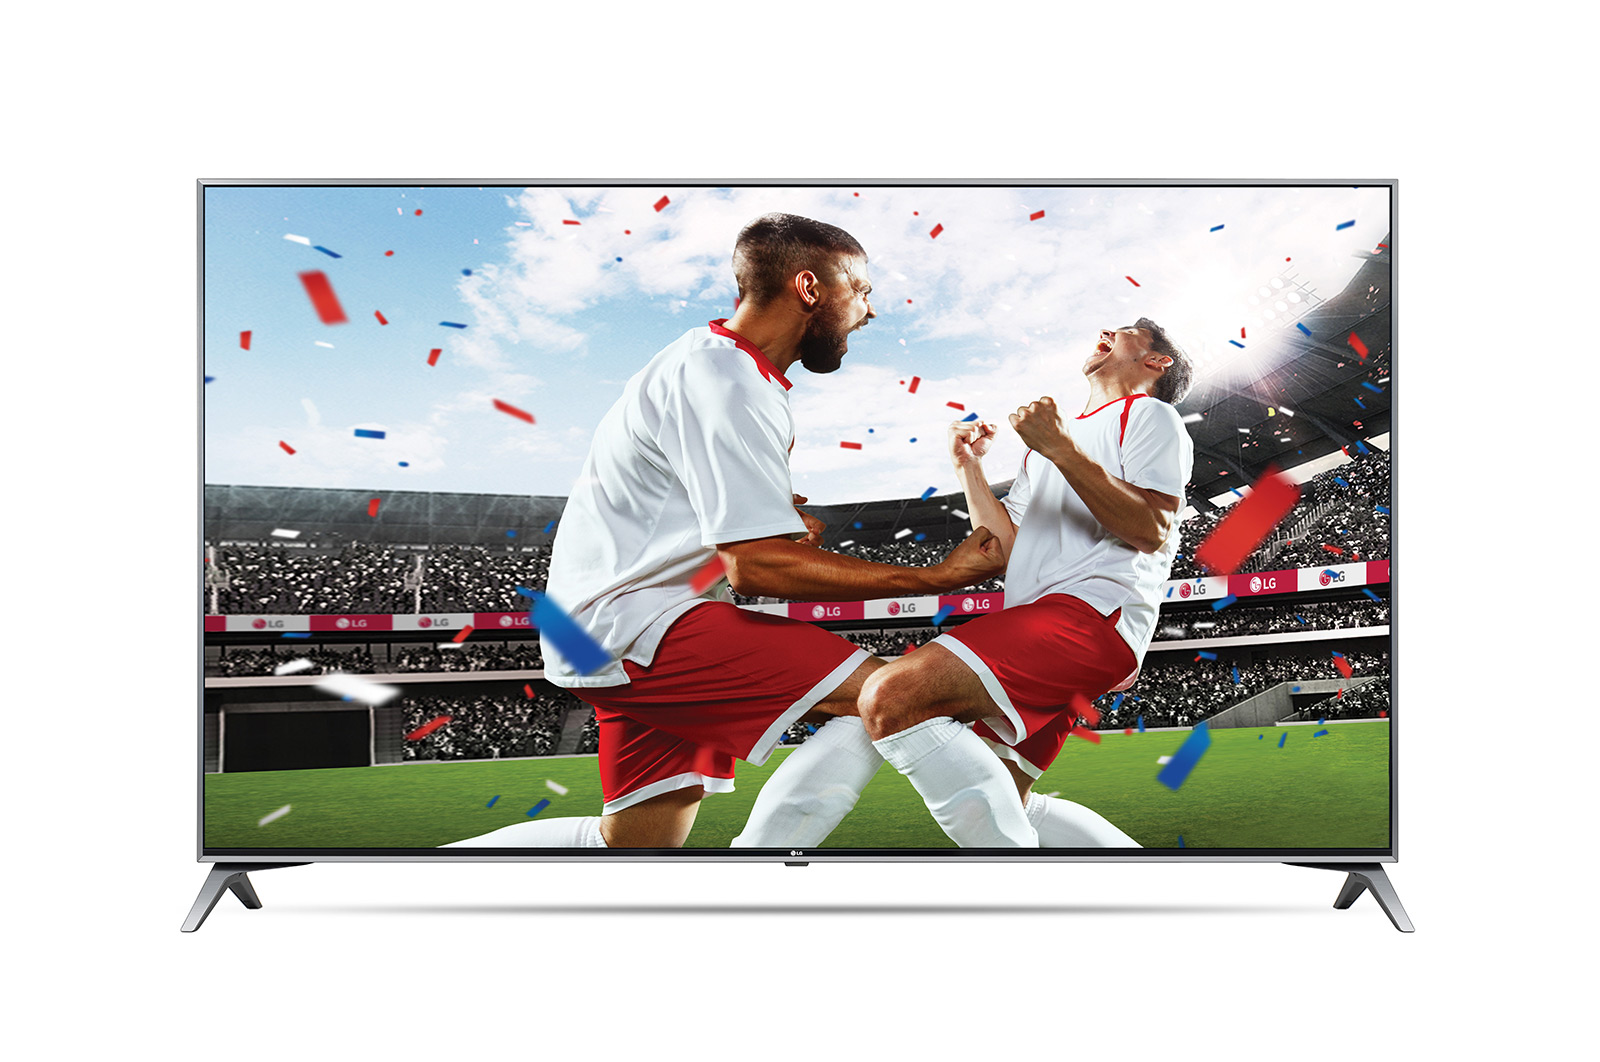 "LG 65SK7900 SMART LED TV 65"" (164cm) Super UHD"